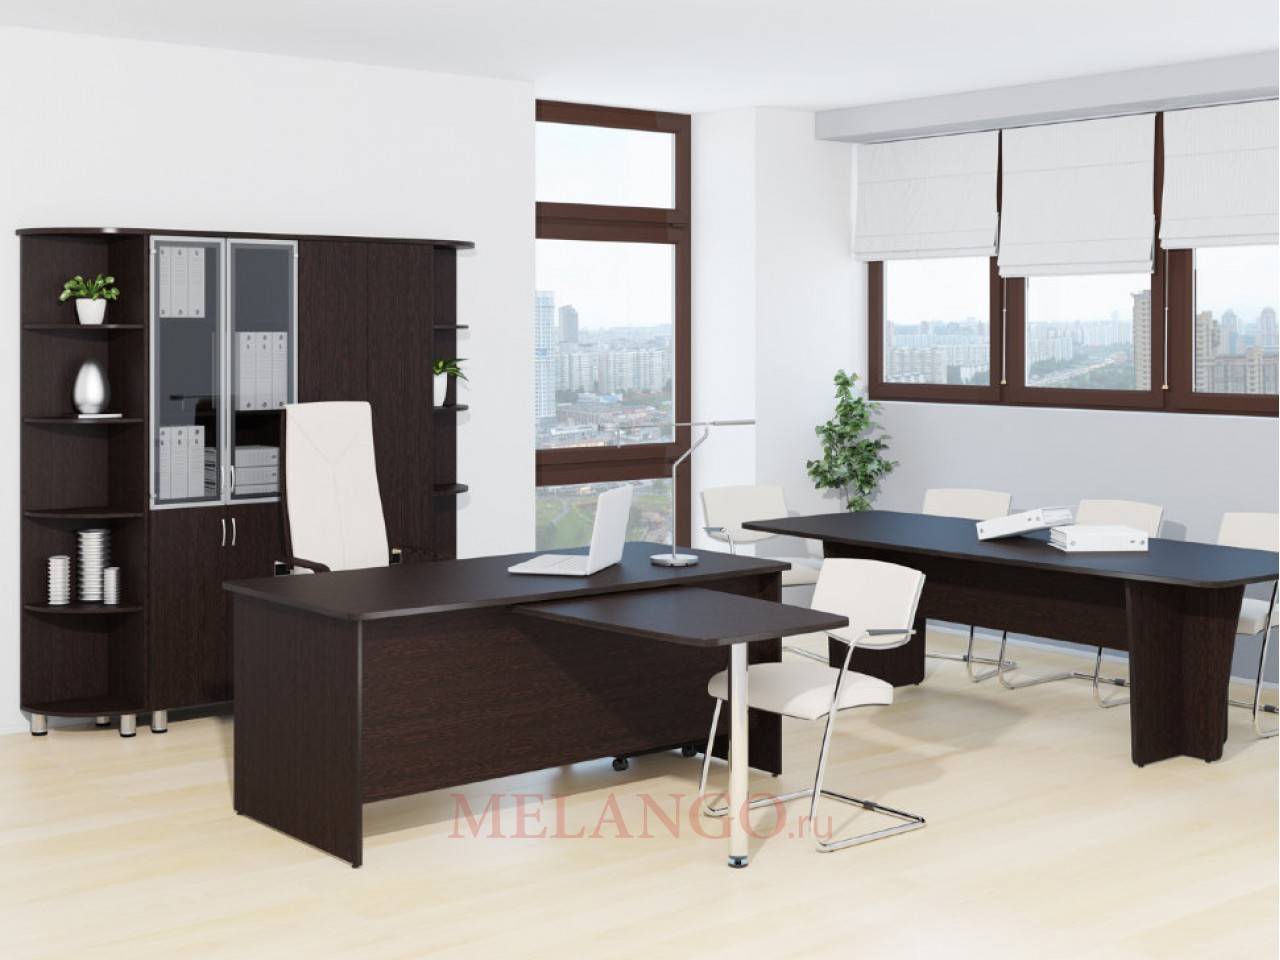 Набор мебели для офиса Лидер-Престиж 4